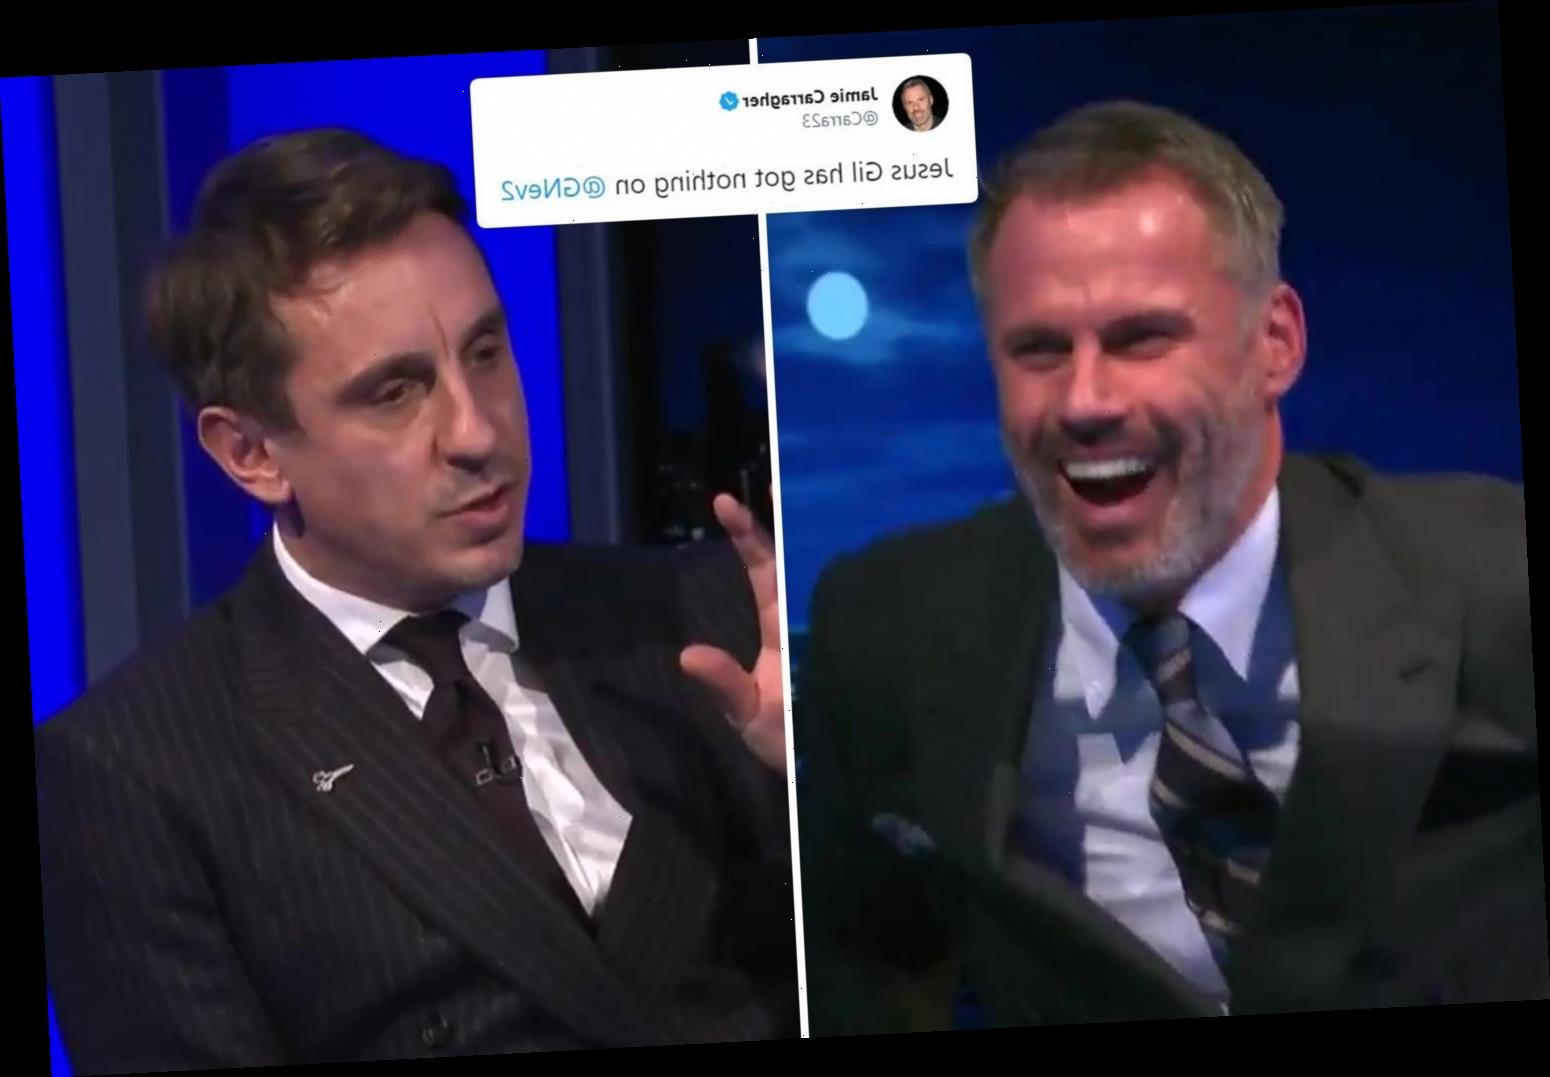 Carragher mocks Neville over sacking Wellens at Salford in brutal tweet after digging up old moan about axing bosses